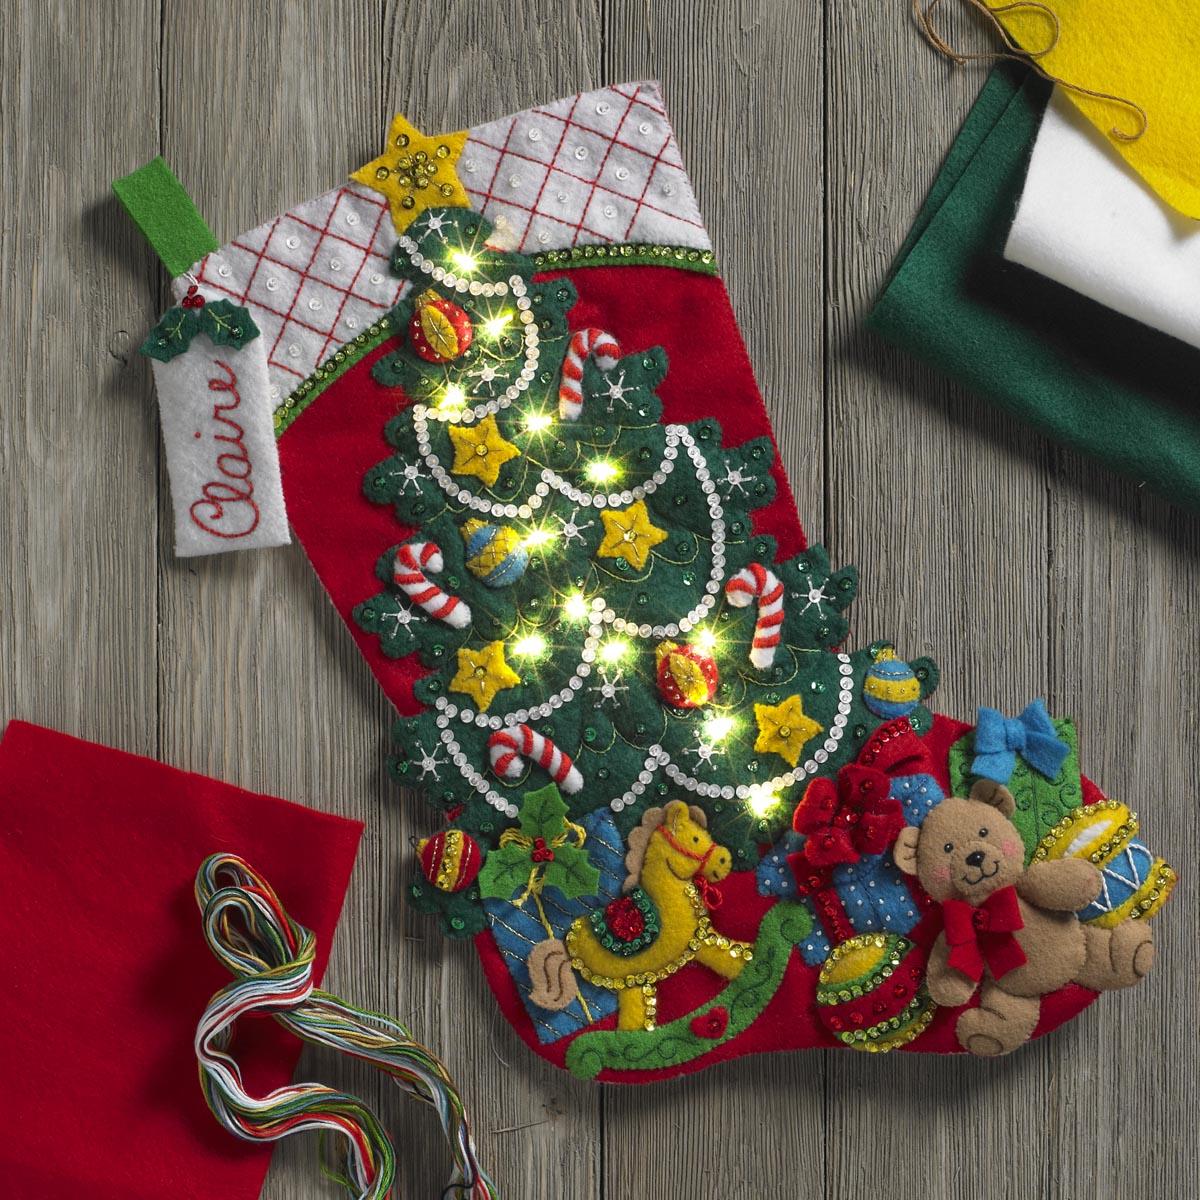 Bucilla ® Seasonal - Felt - Stocking Kits - Christmas Tree Surprise with Lights